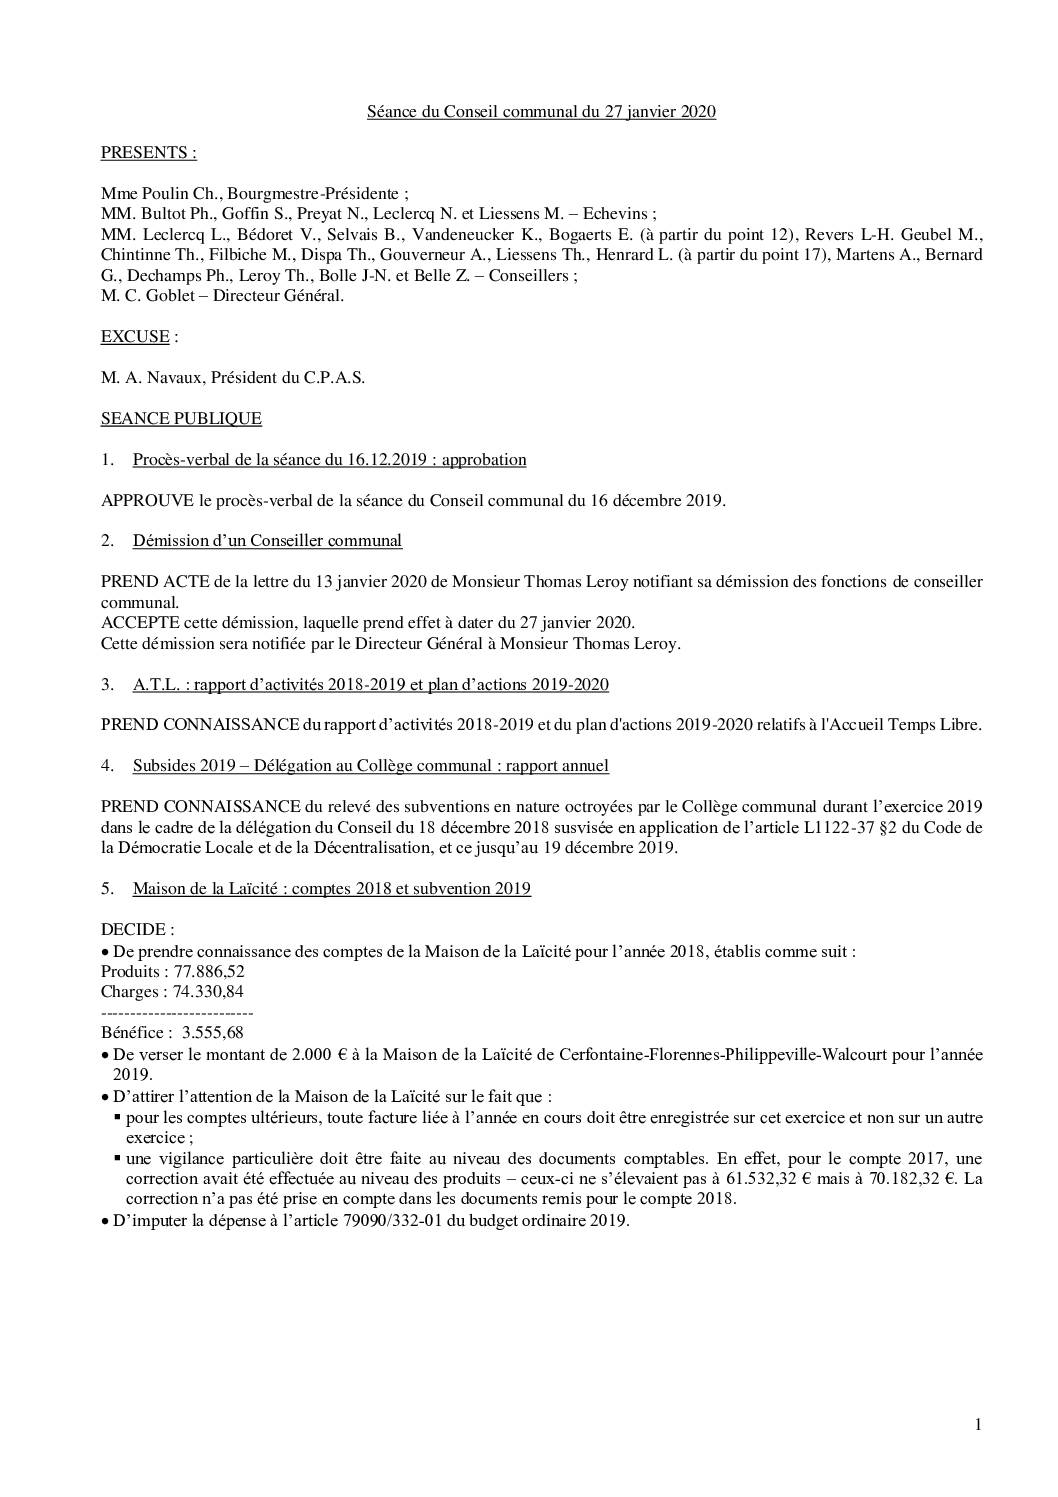 Conseil communal – 27 janvier 2020